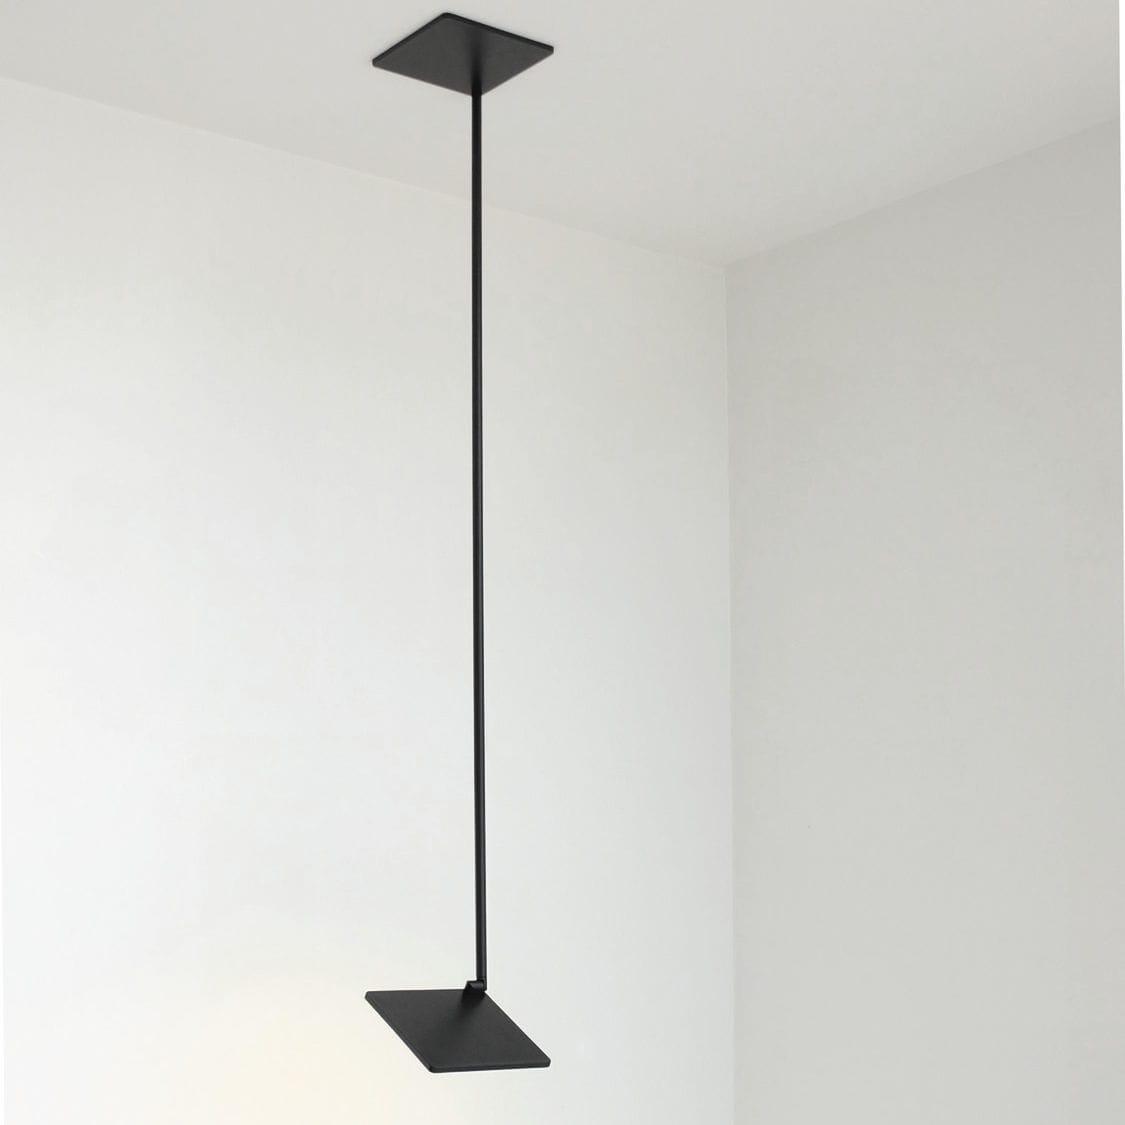 Hanging light fixture oled square aluminum ohled by bart hanging light fixture oled square aluminum ohled by bart lens arubaitofo Choice Image